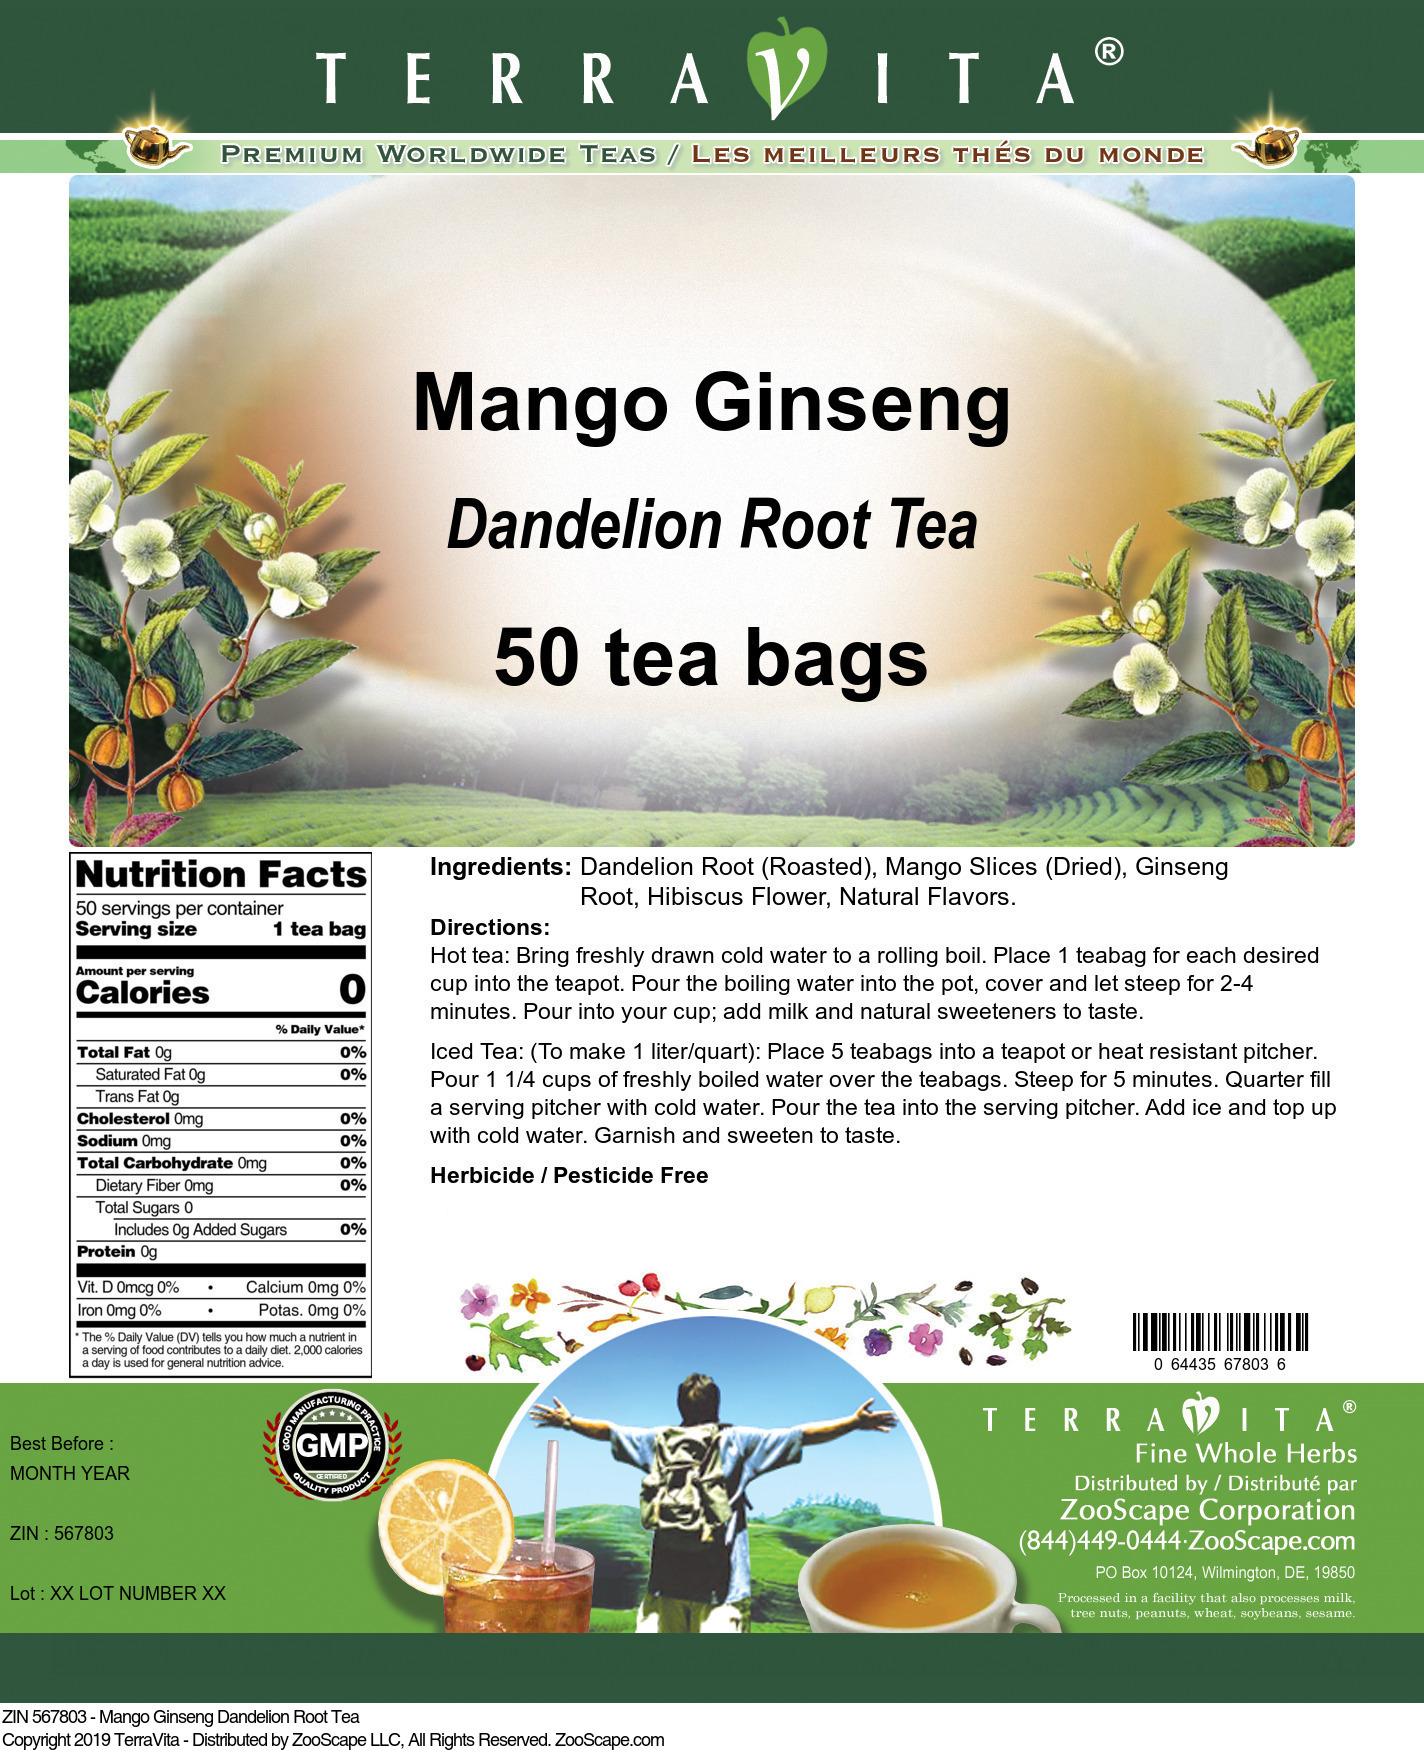 Mango Ginseng Dandelion Root Tea